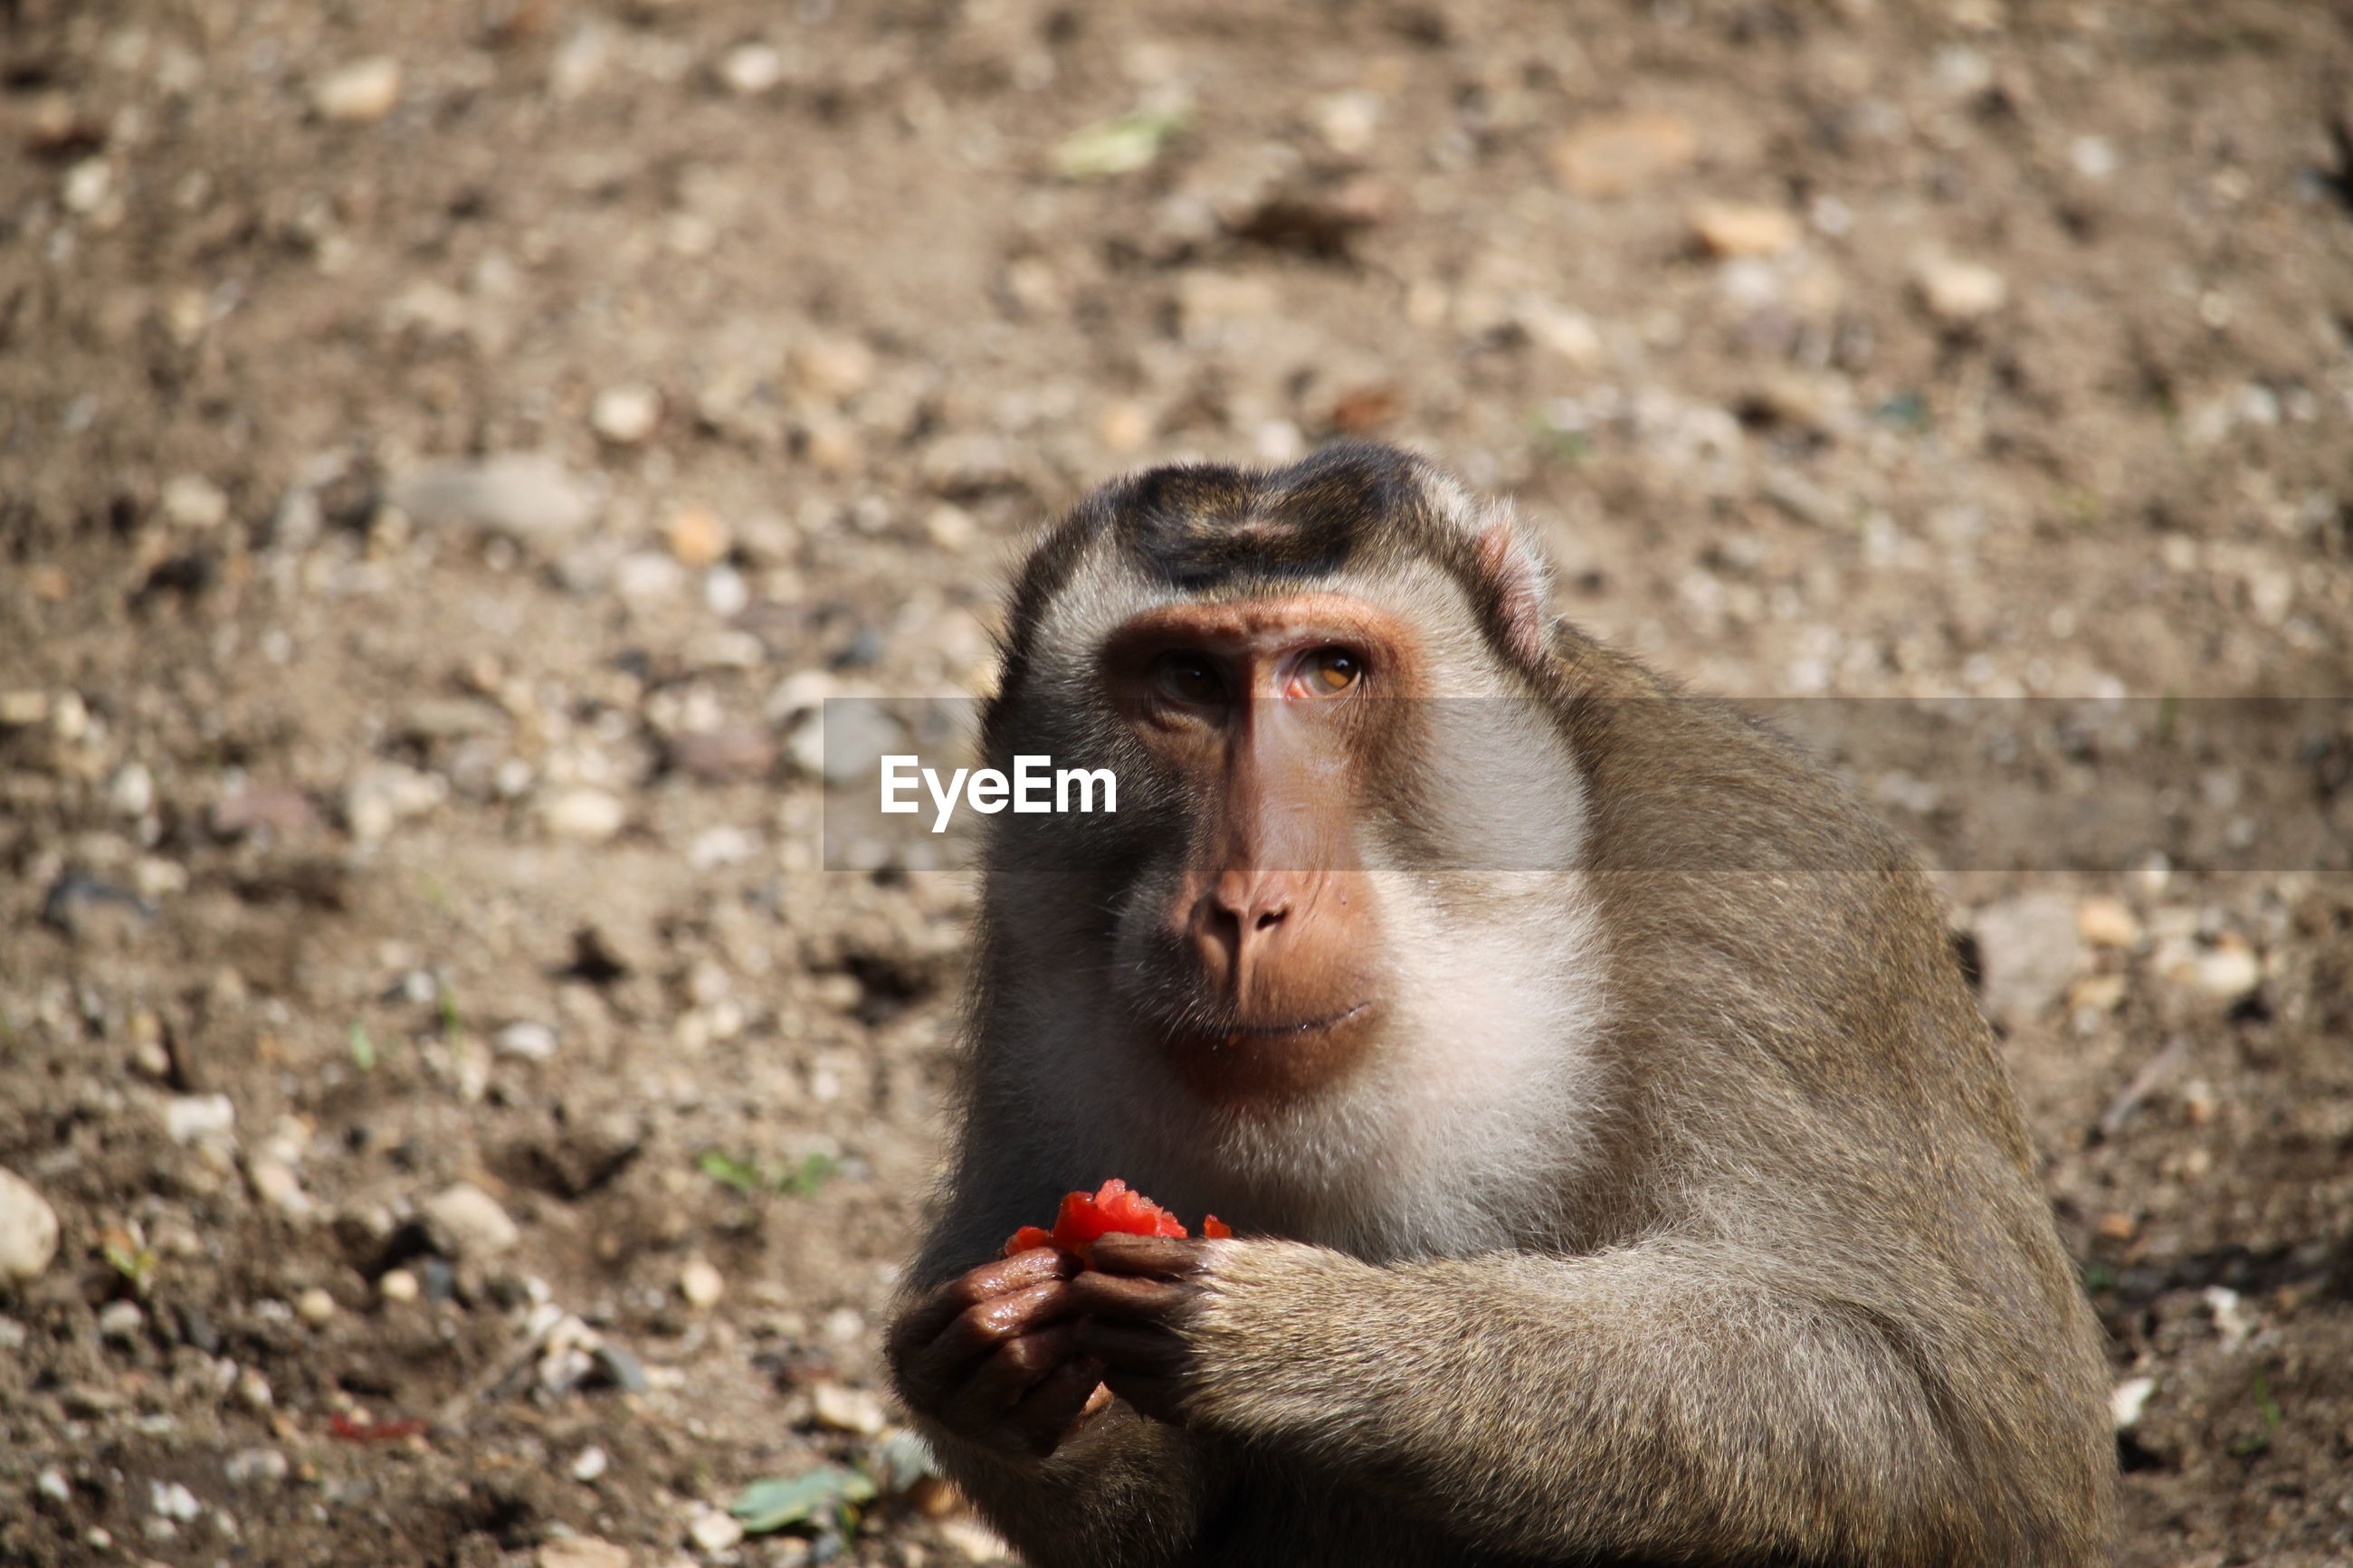 Portrait of young monkey eating lying on land